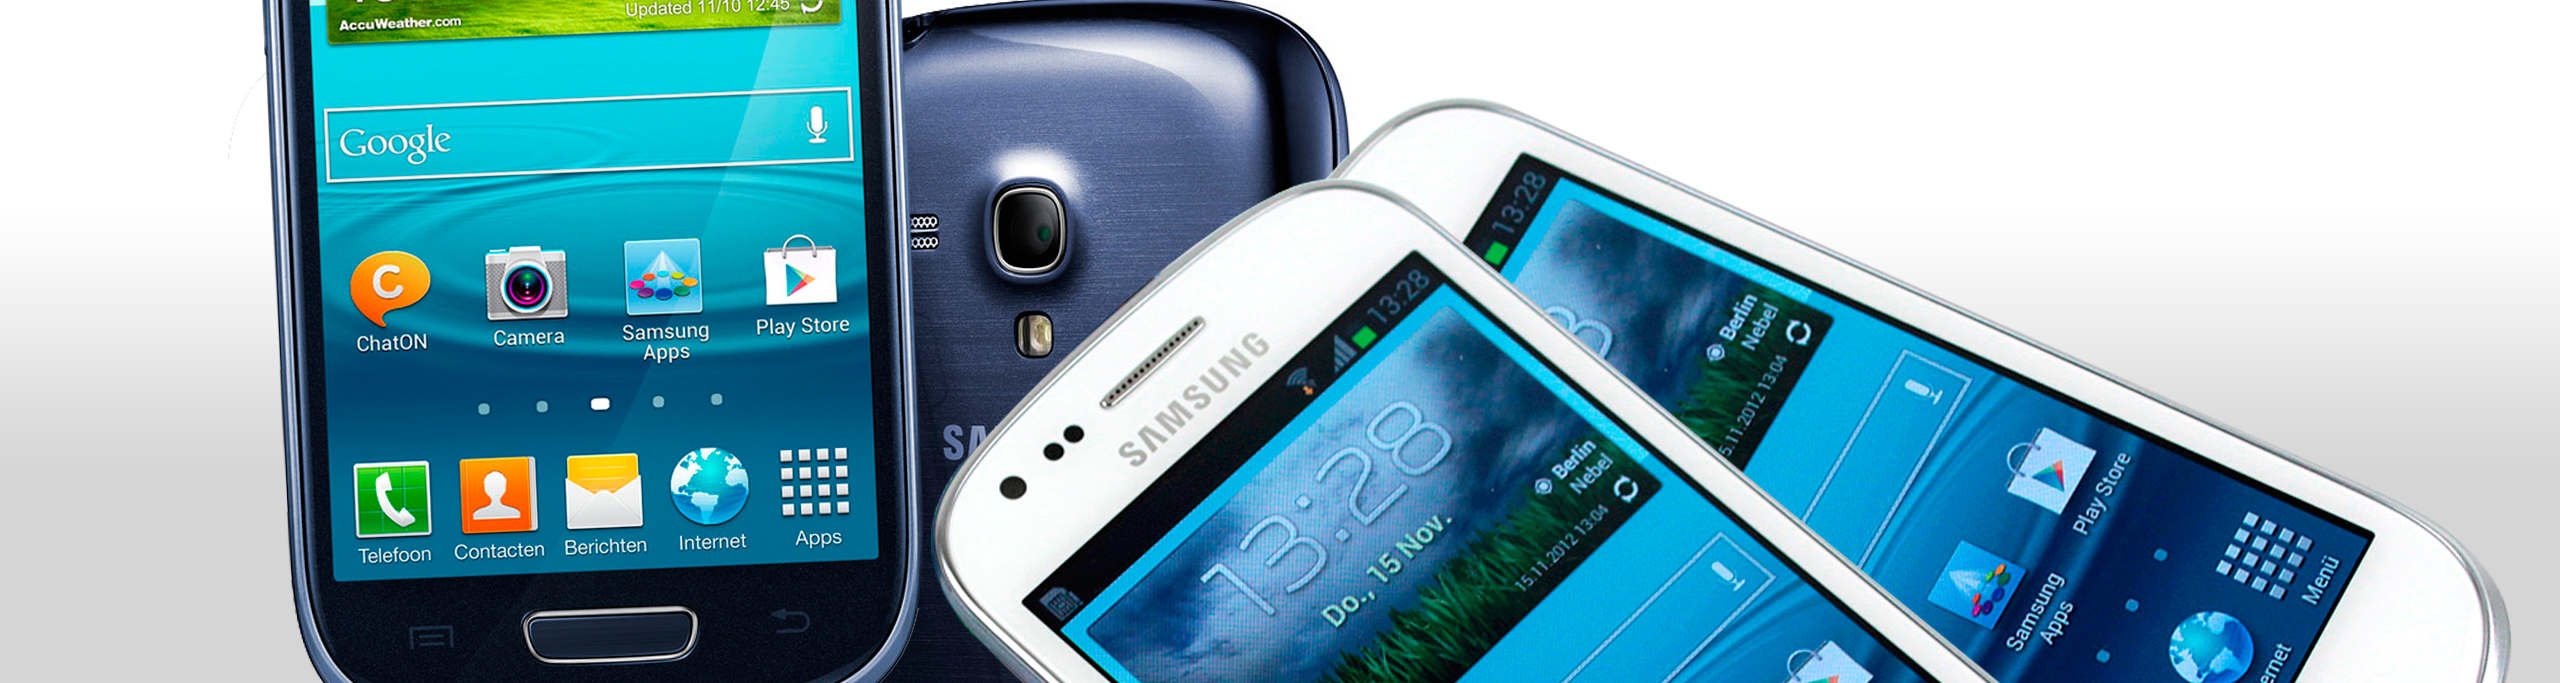 S3 Mini (i8190)